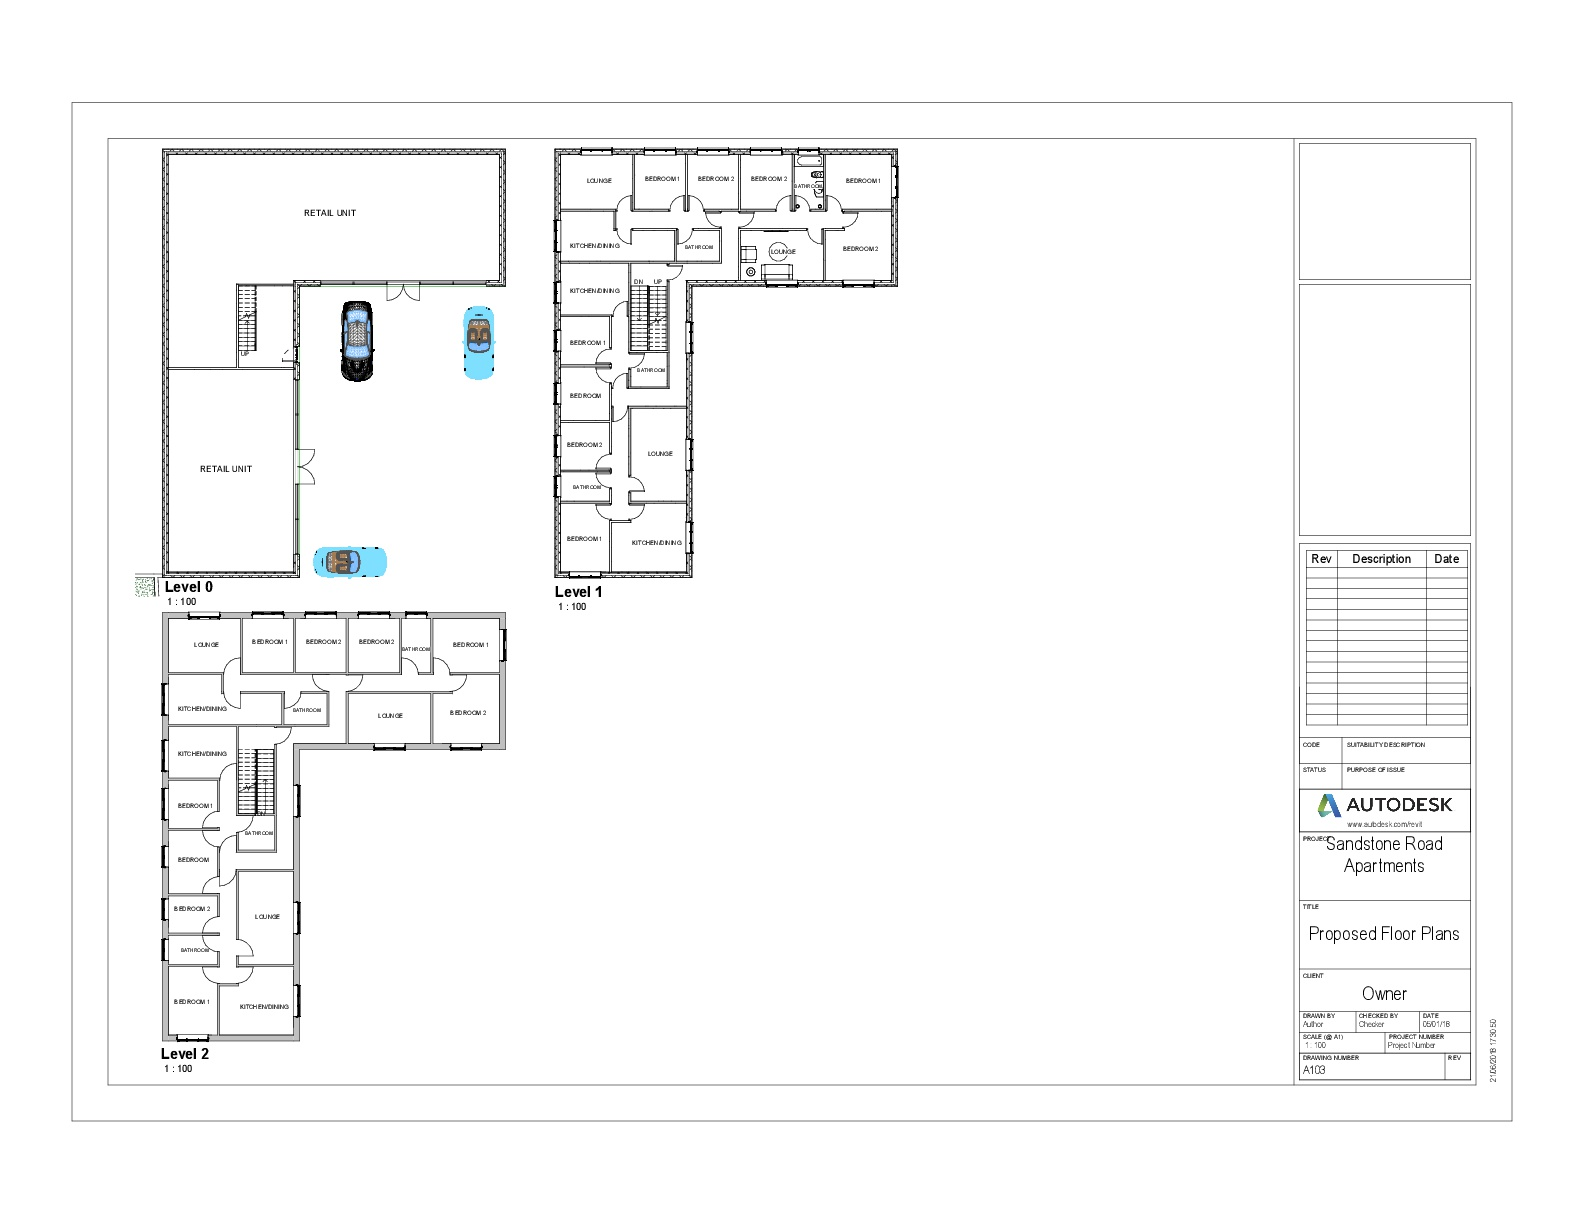 Sandstone-Road-Apartments-Plans-3-001